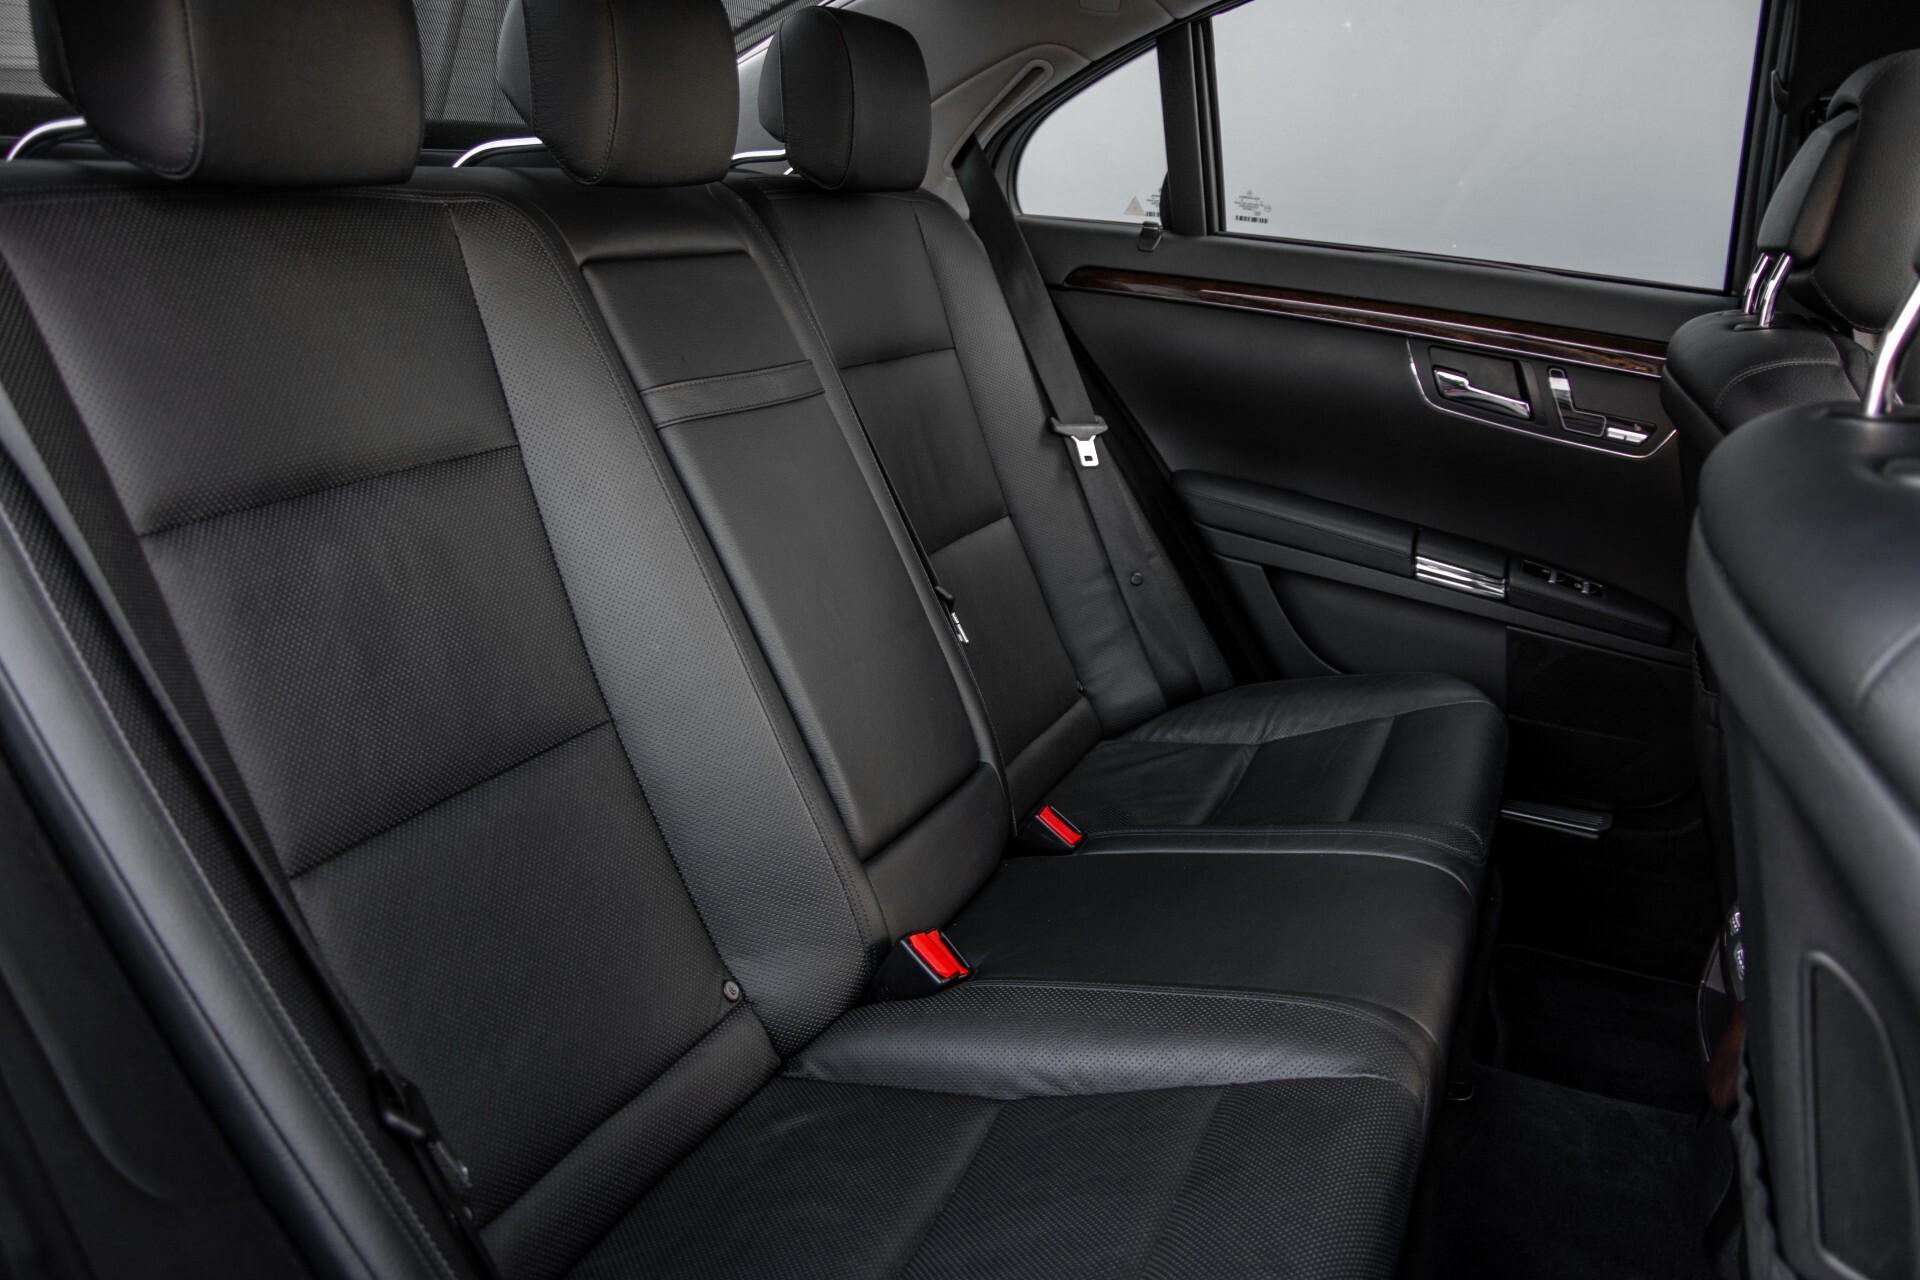 Mercedes-Benz S-Klasse 350 Bluetec Keyless/Distronic/Nightvision/Schuifdak/Harman-Kardon Aut7 Foto 5